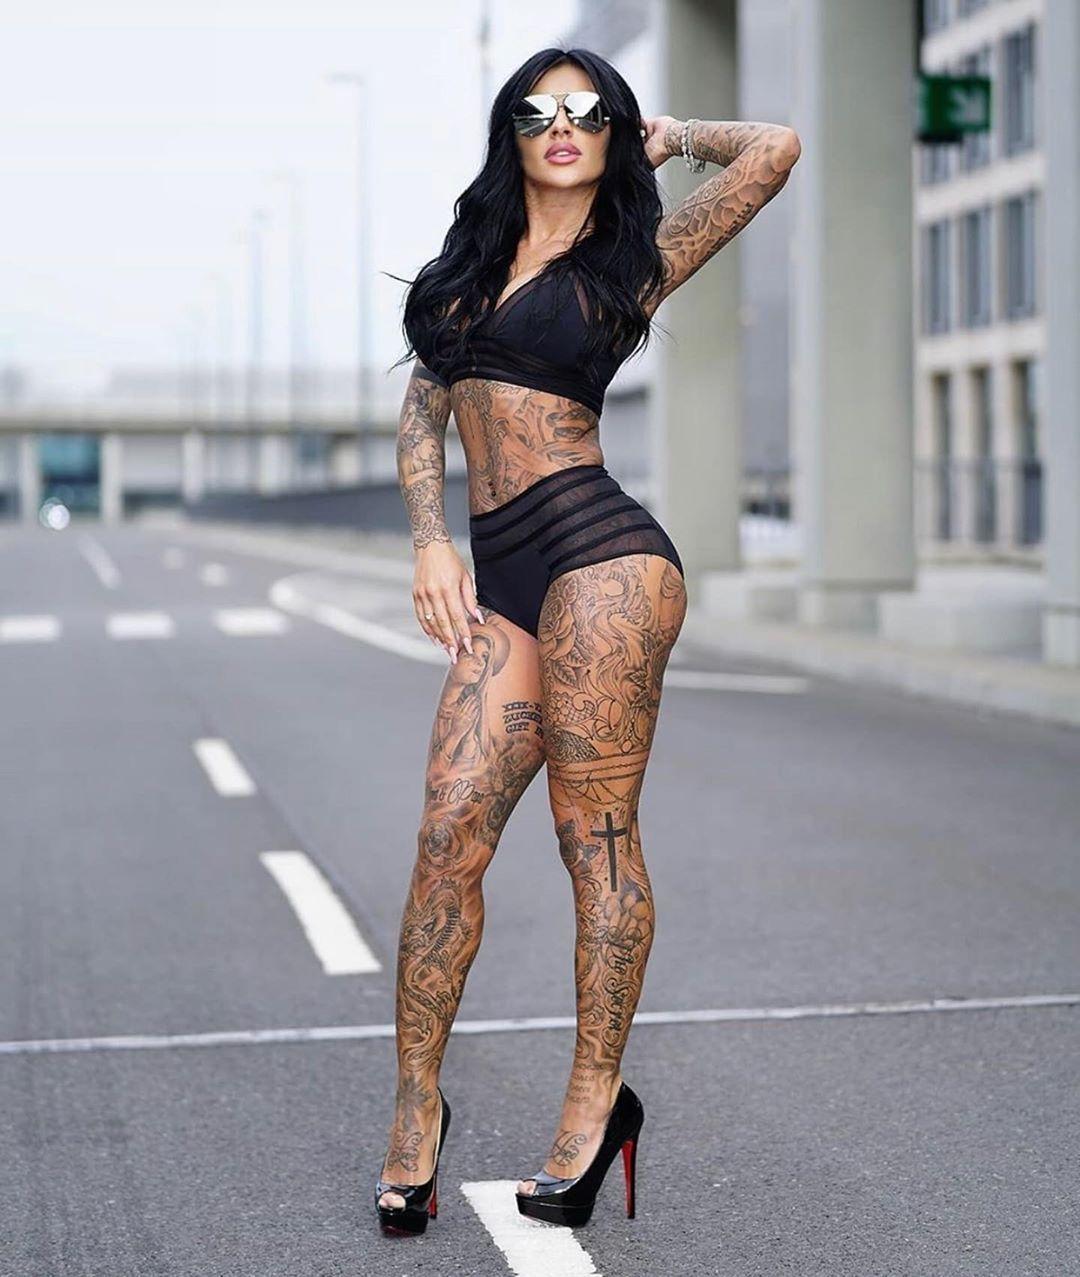 💘💘 👑✖️Like and Follow @tattoo_4me!!✖️👑 All right are reserved to their rightful owner(s) via: @followjuliajasmin  #inkedlife #inkedlove #inkedlegs  #inked #inked #inkgirl #inkedgirl  #inked up #inkstagram #inkaddict #inkspiration  #tattooedgirls #tattoos #tattoogirl  #girlswithtattoos #tattoowoman  #tattooofinstagram #tattooworld